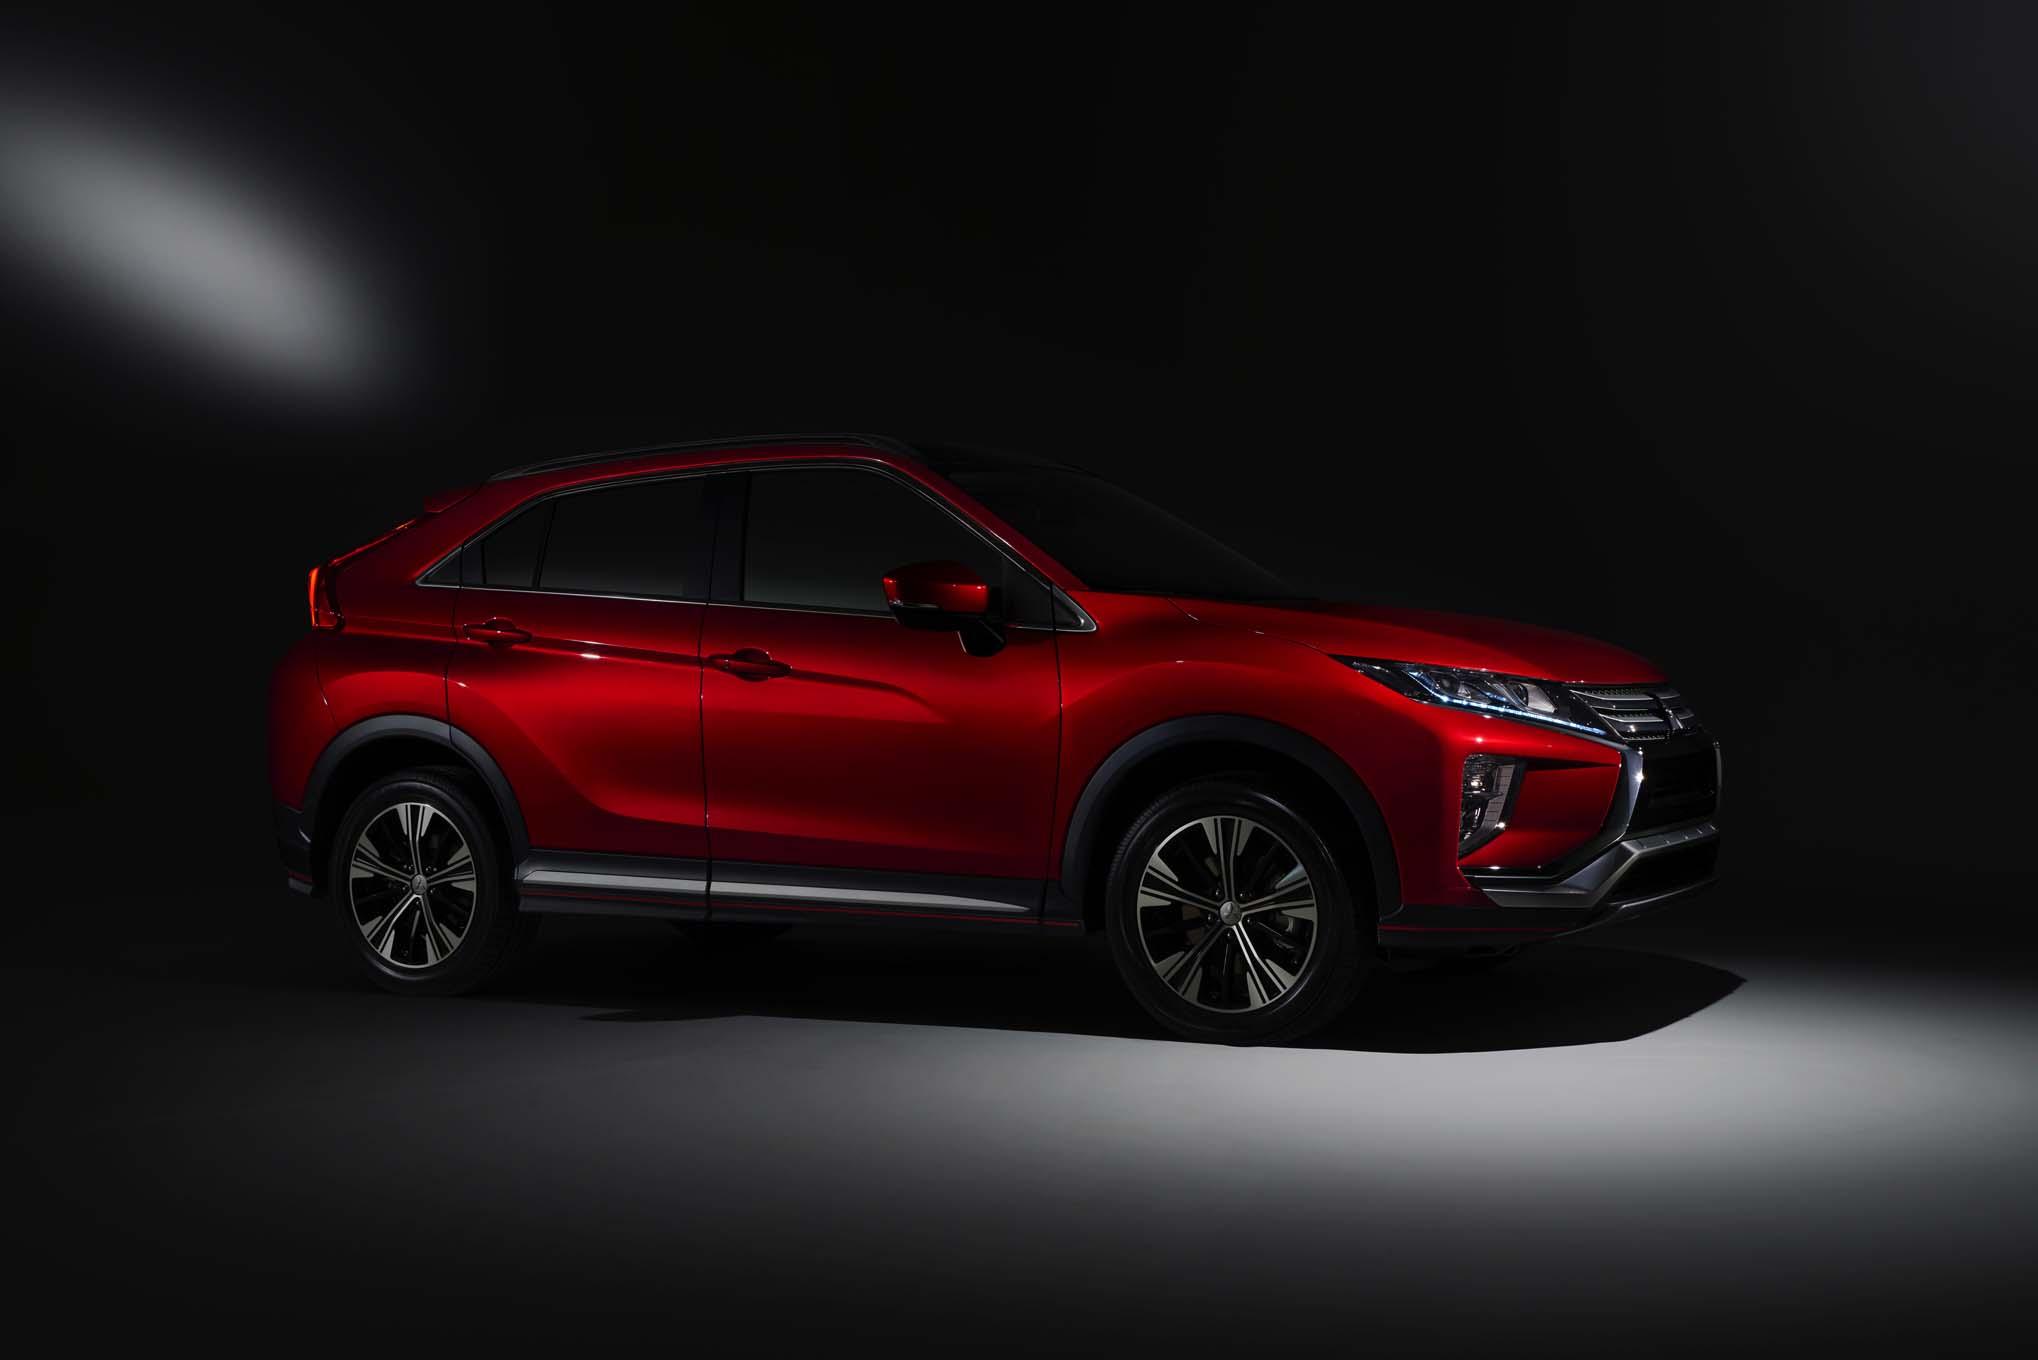 2018 Mitsubishi Eclipse Cross Front Side Three Quarters 1